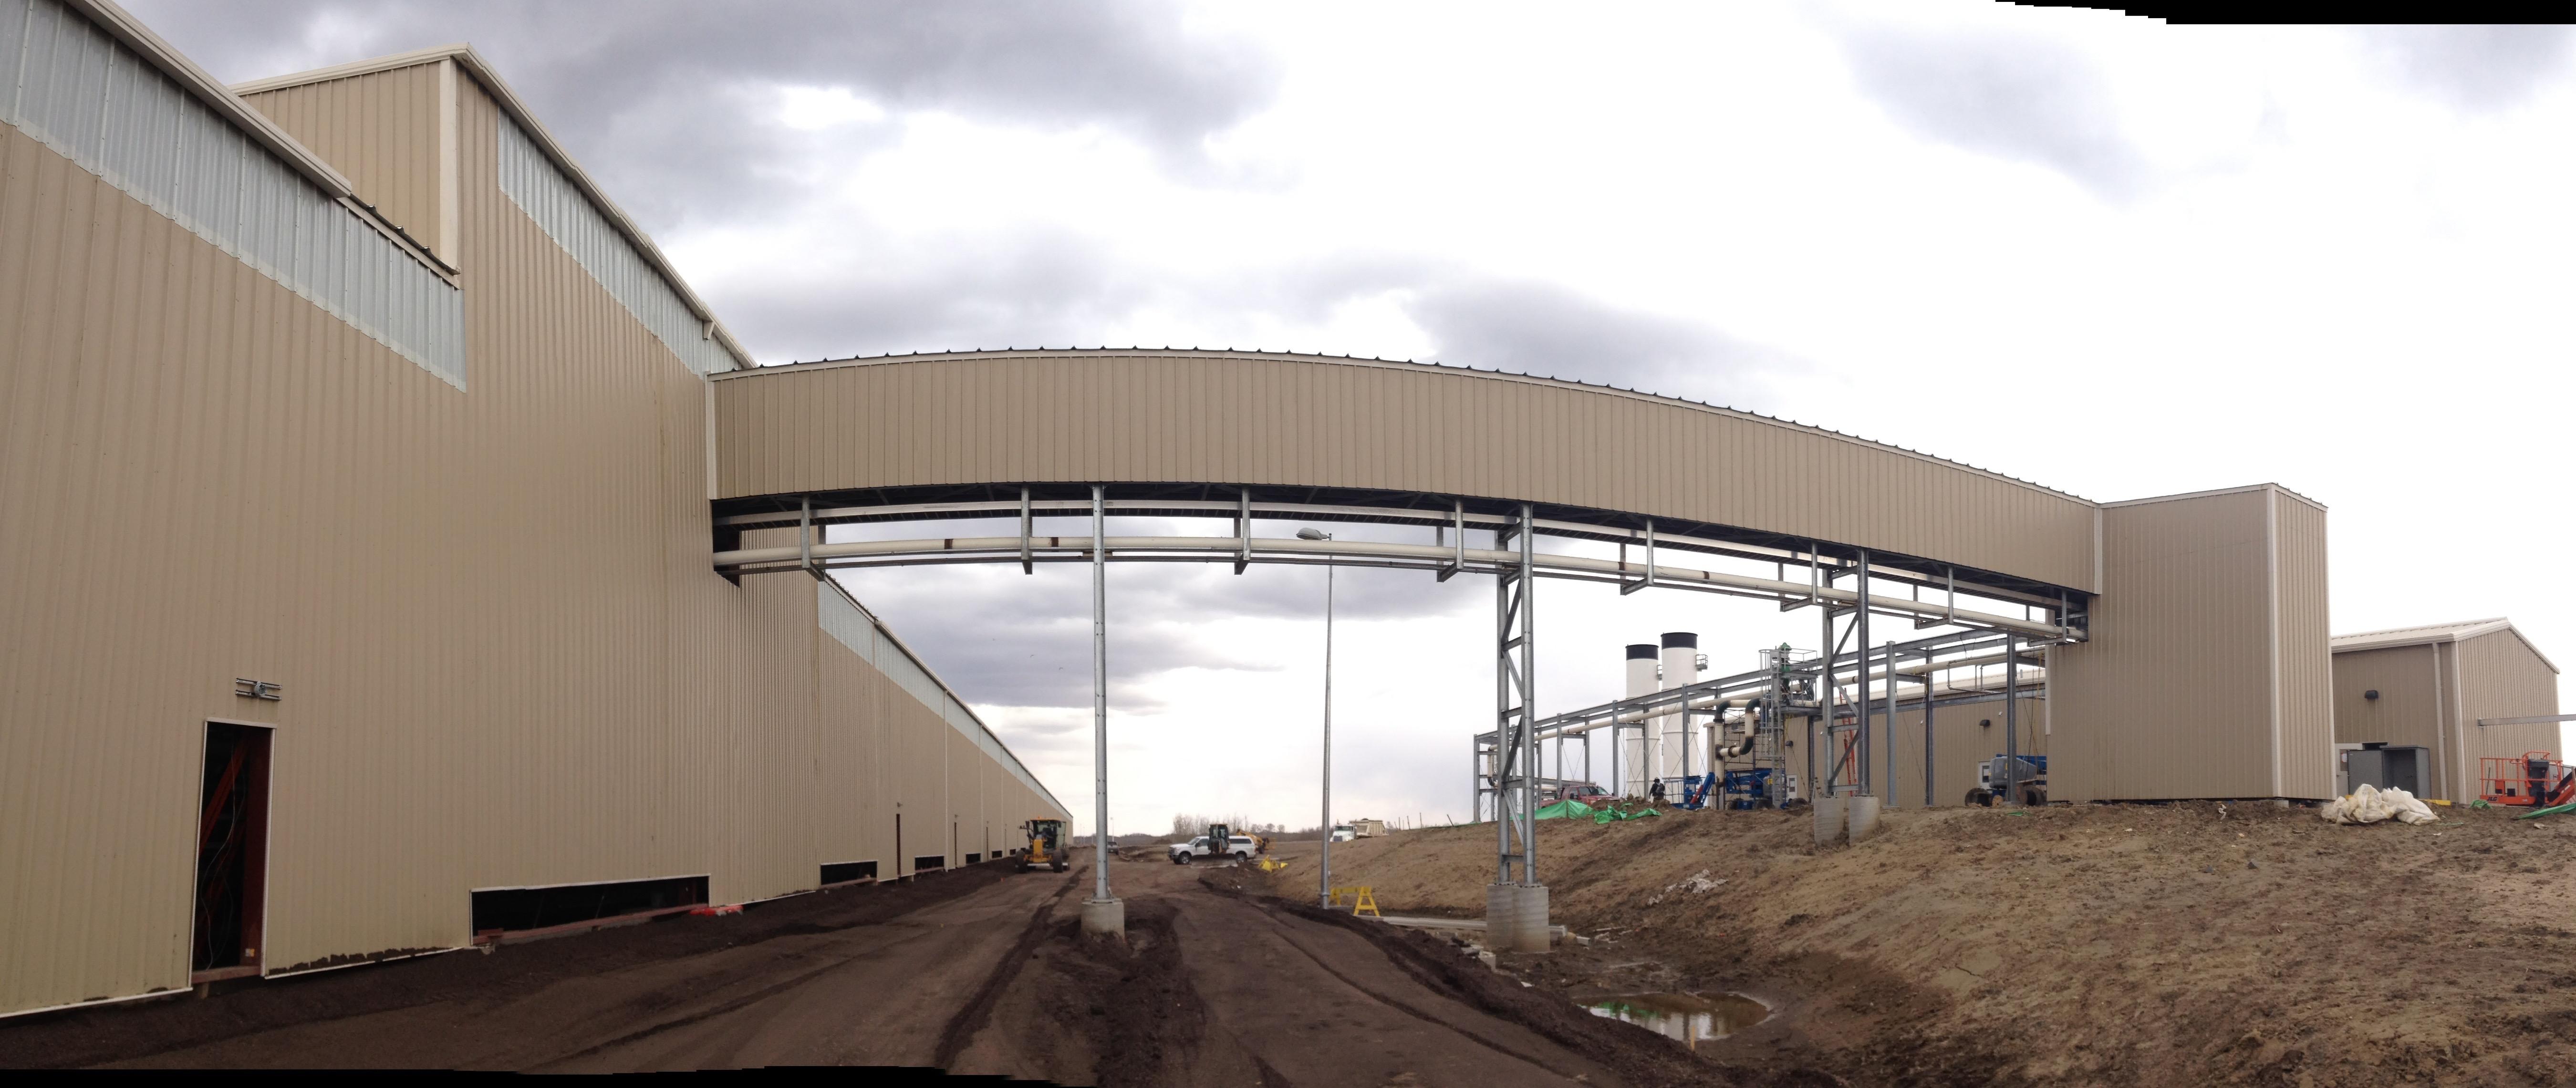 Petroleum Crude Oil Loading Facility Construction Hardisty Alb